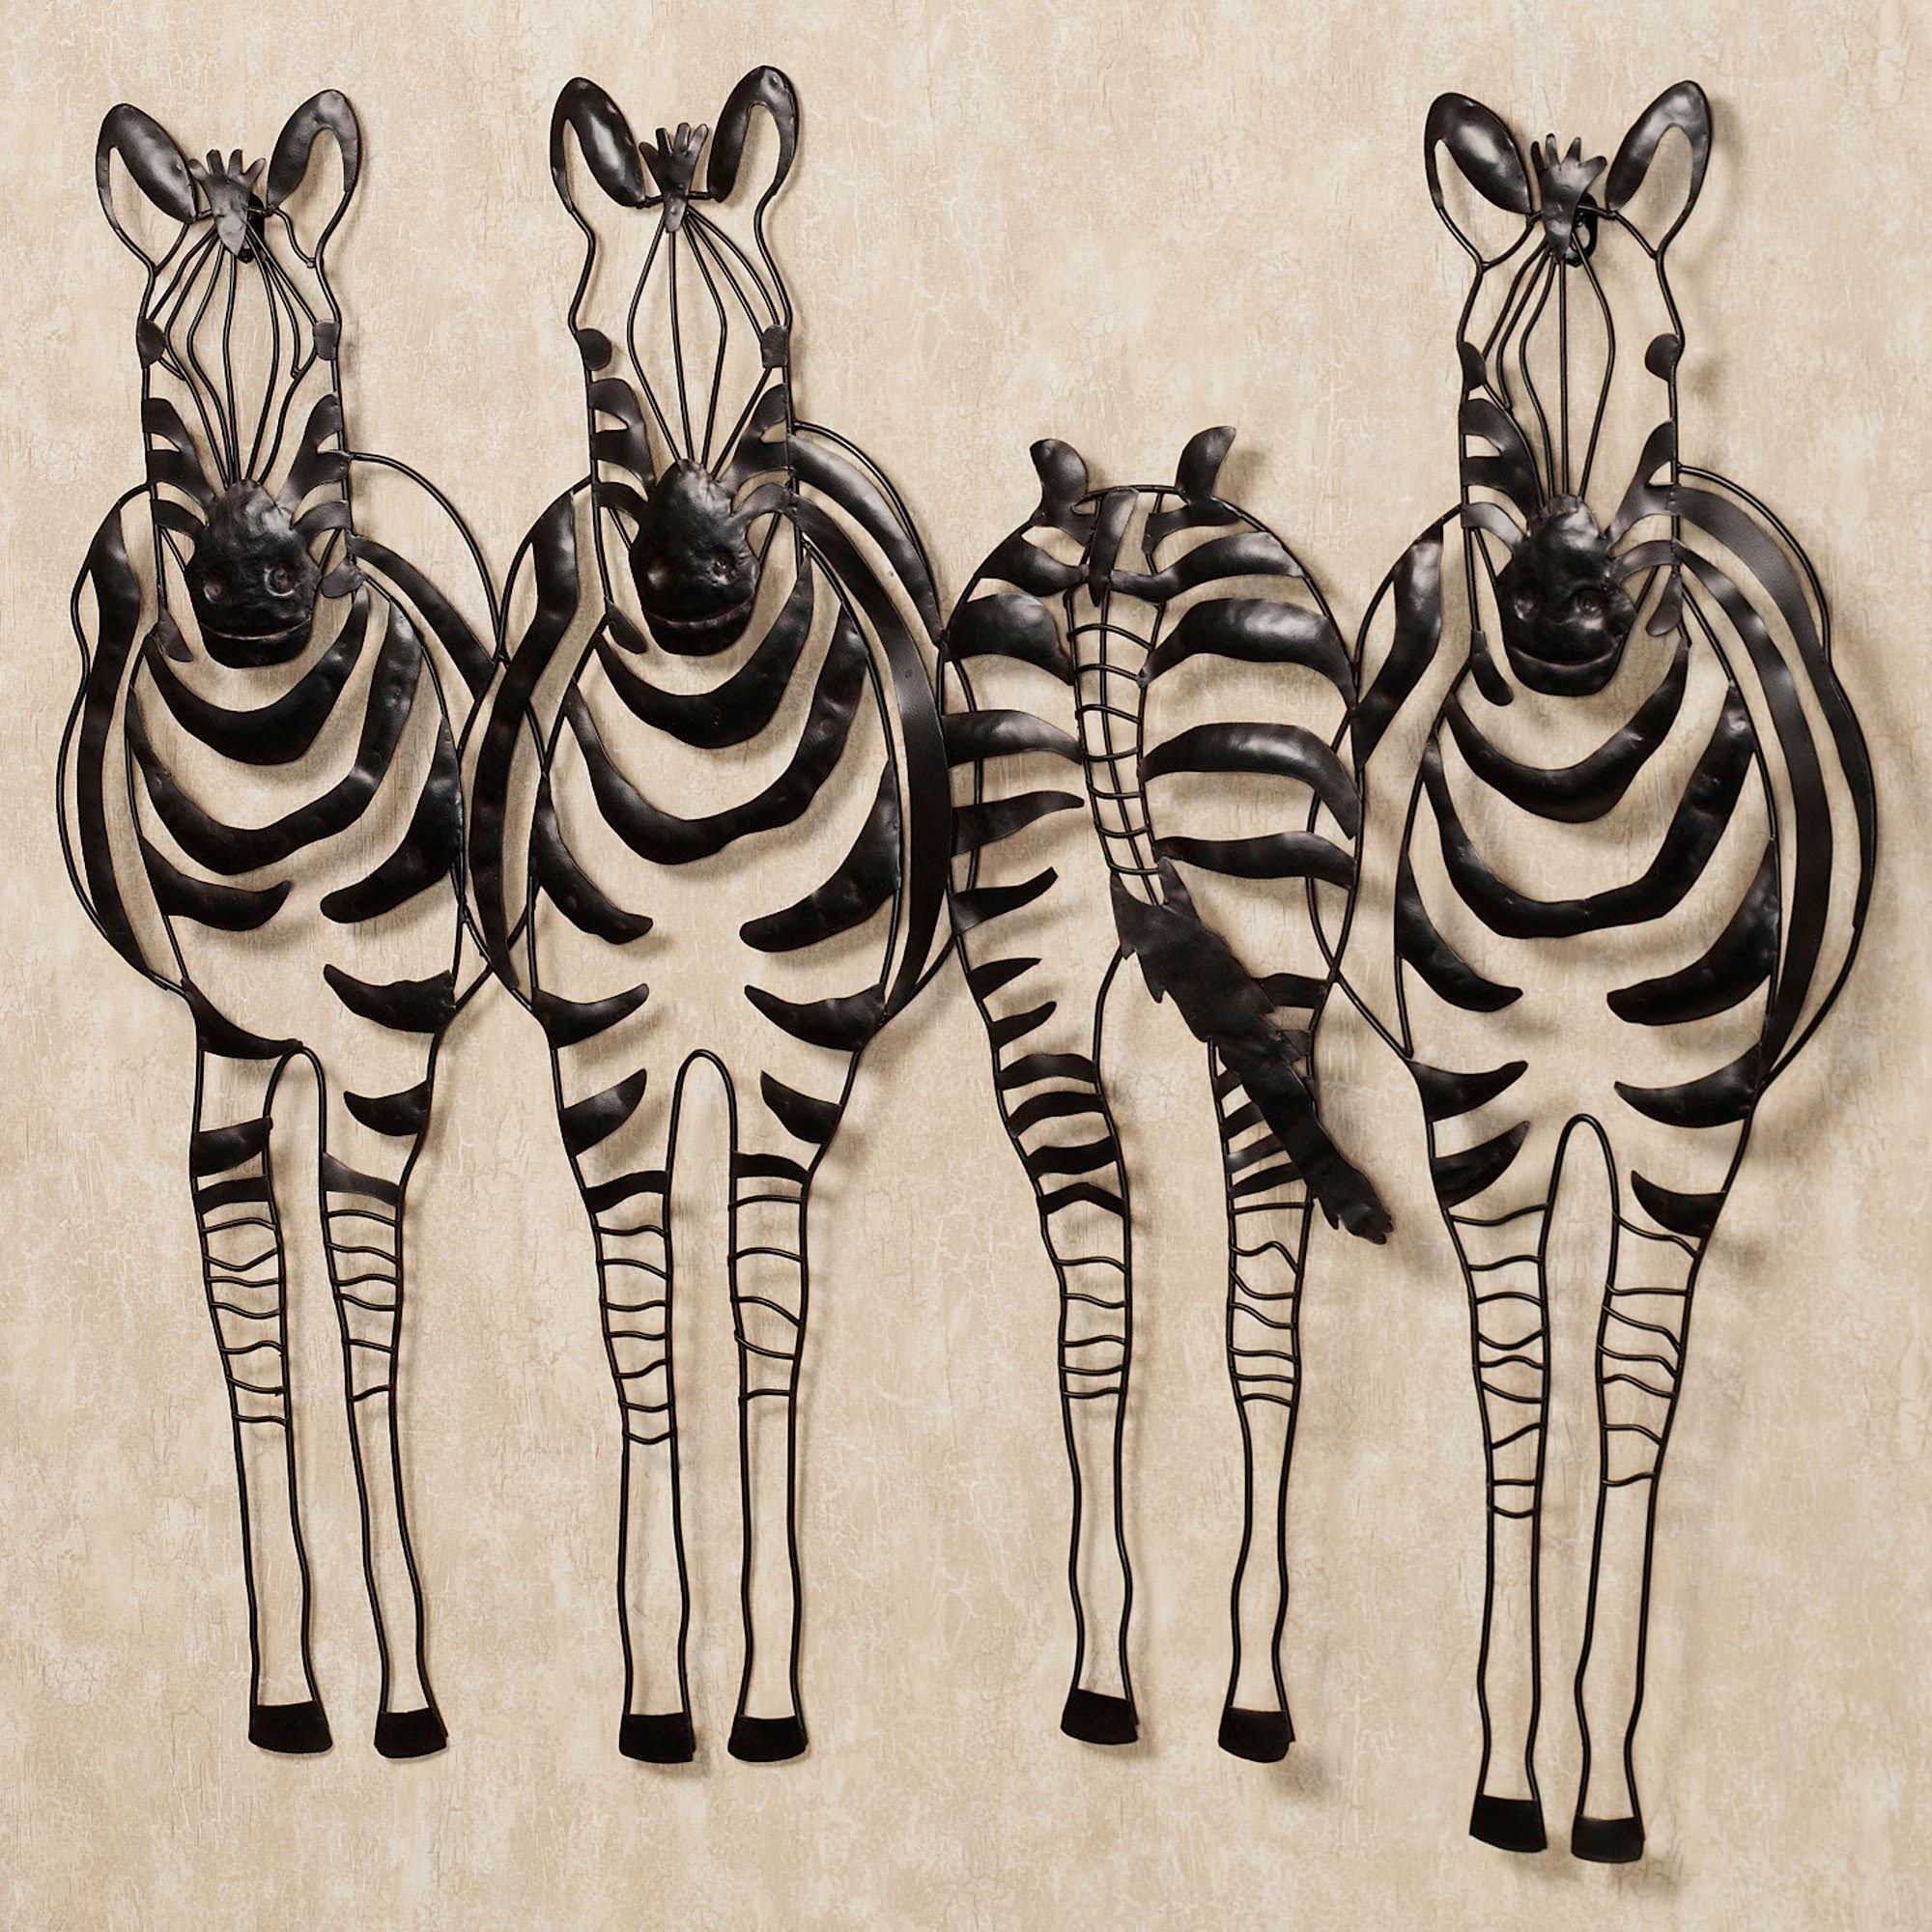 Charmant You Go Your Way Zebra Metal Wall Sculpture Art